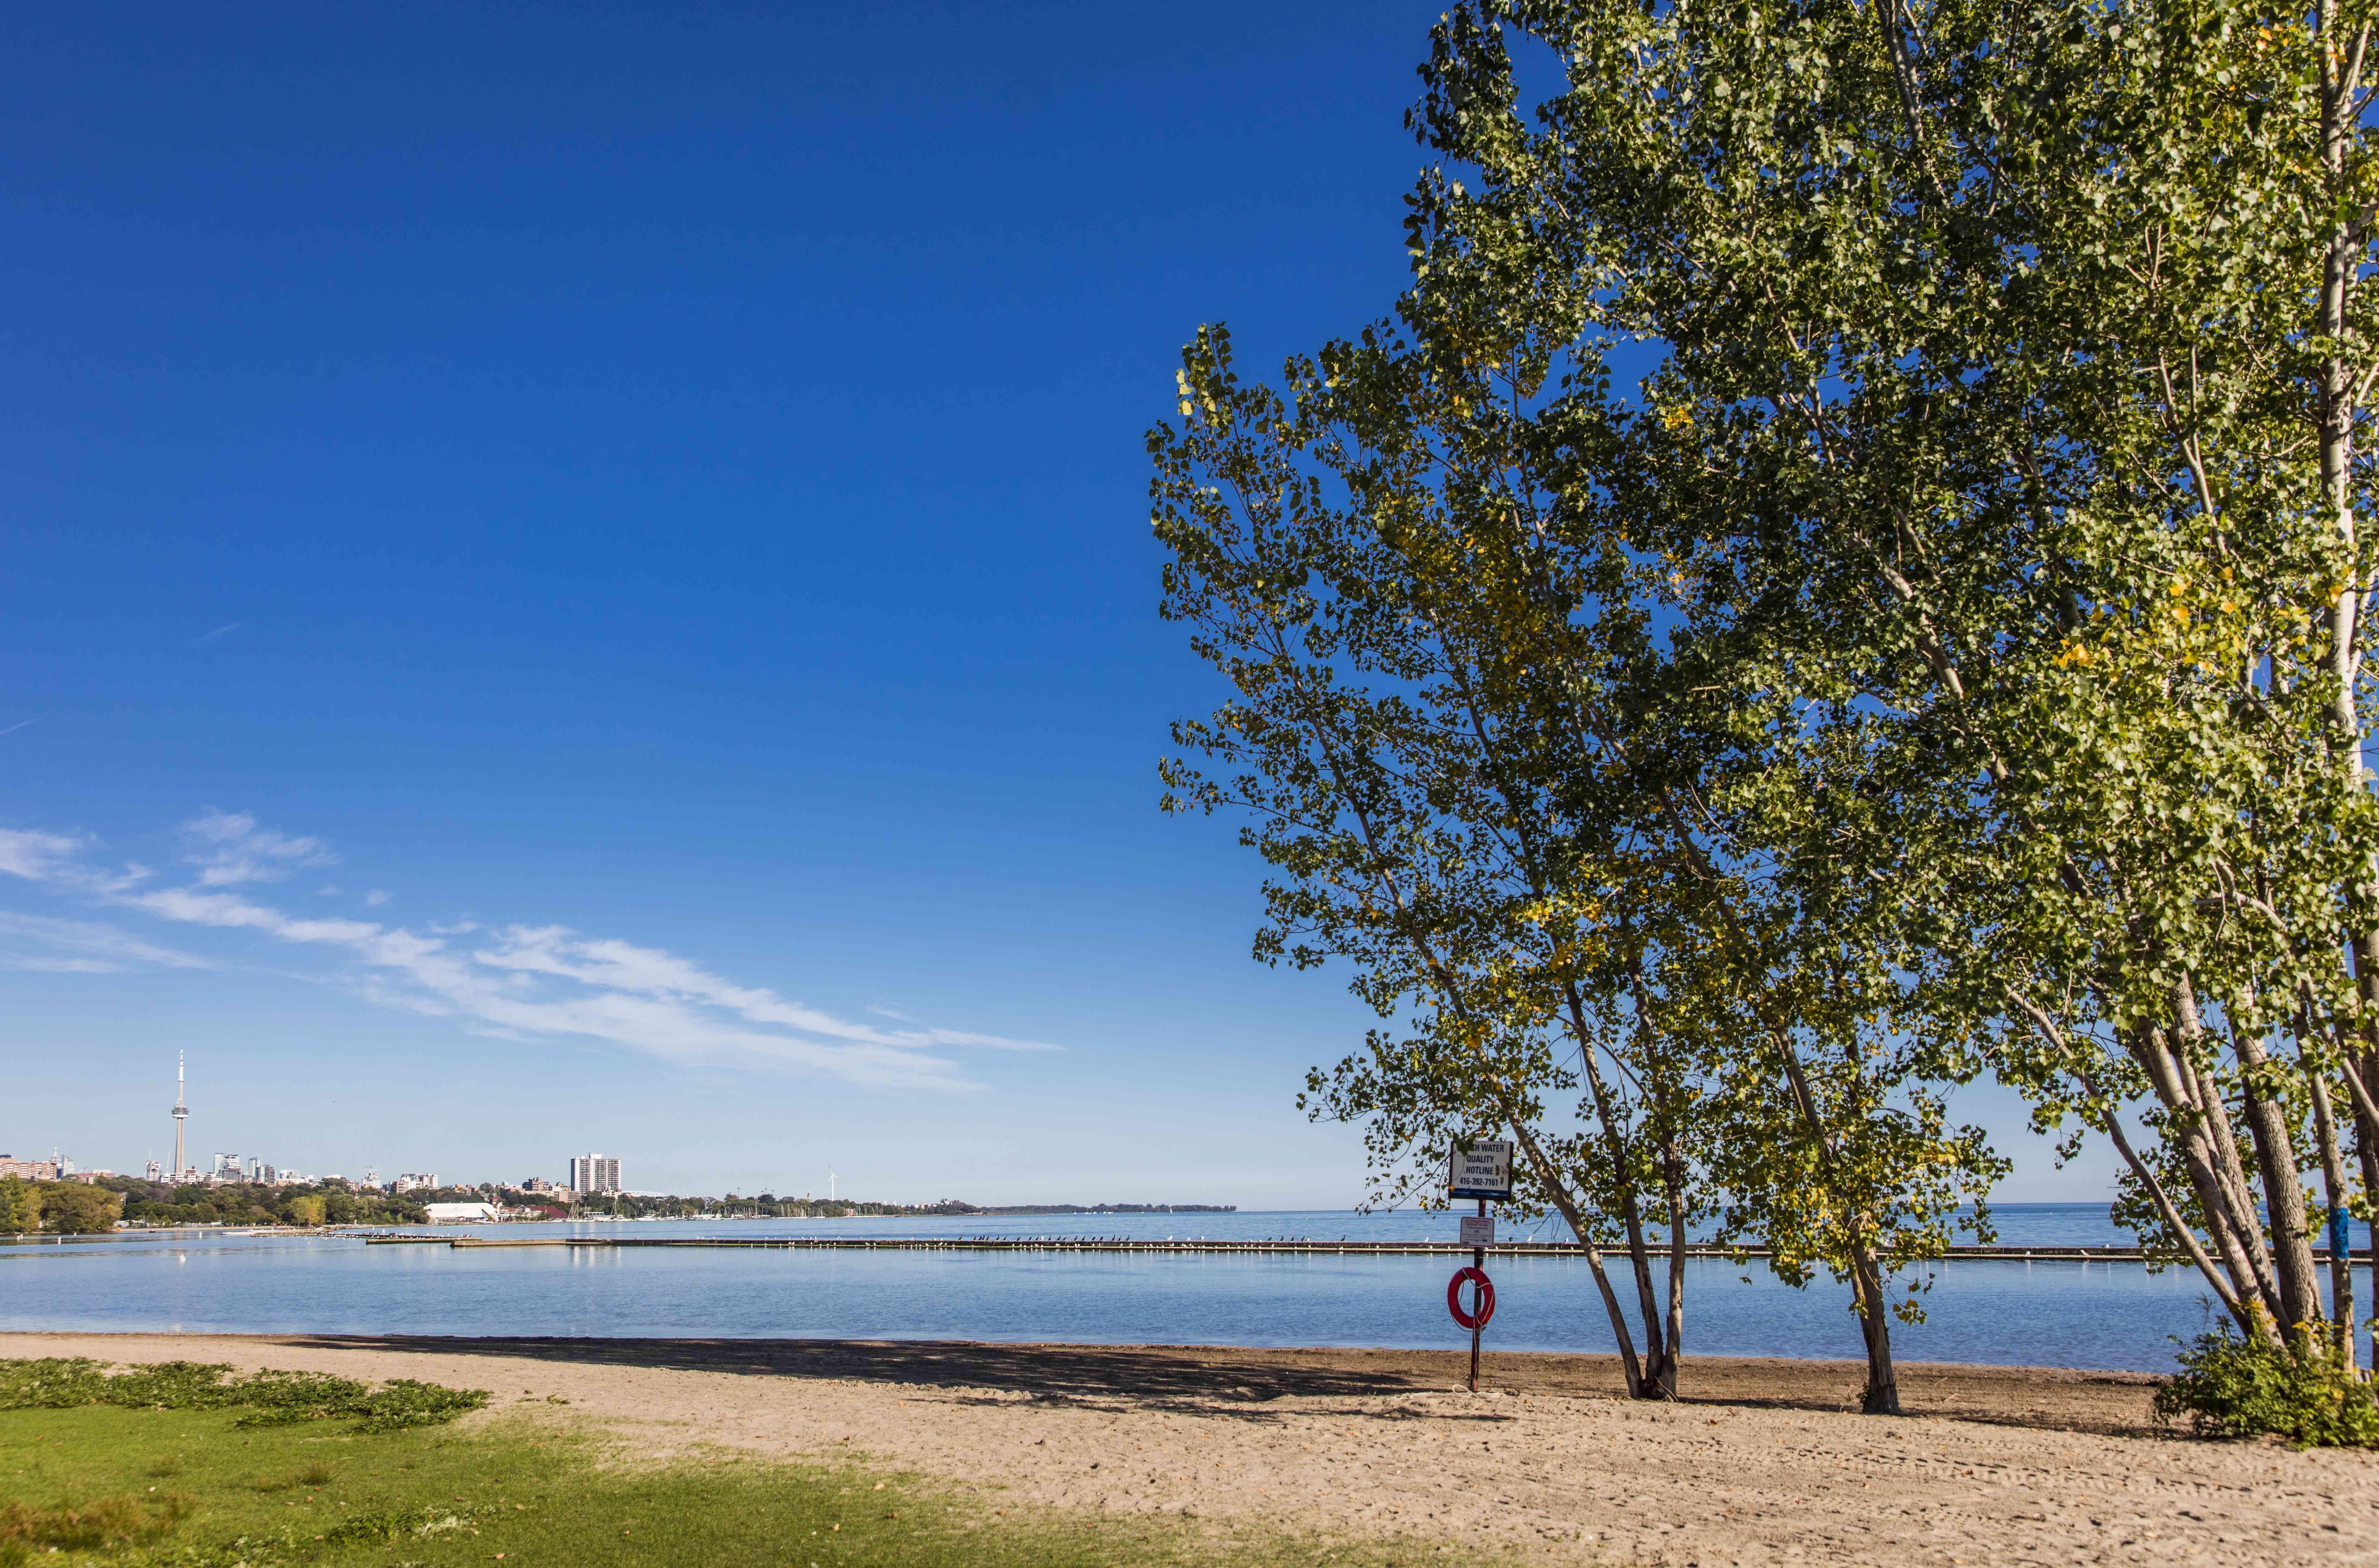 Sunnyside Beach in Toronto